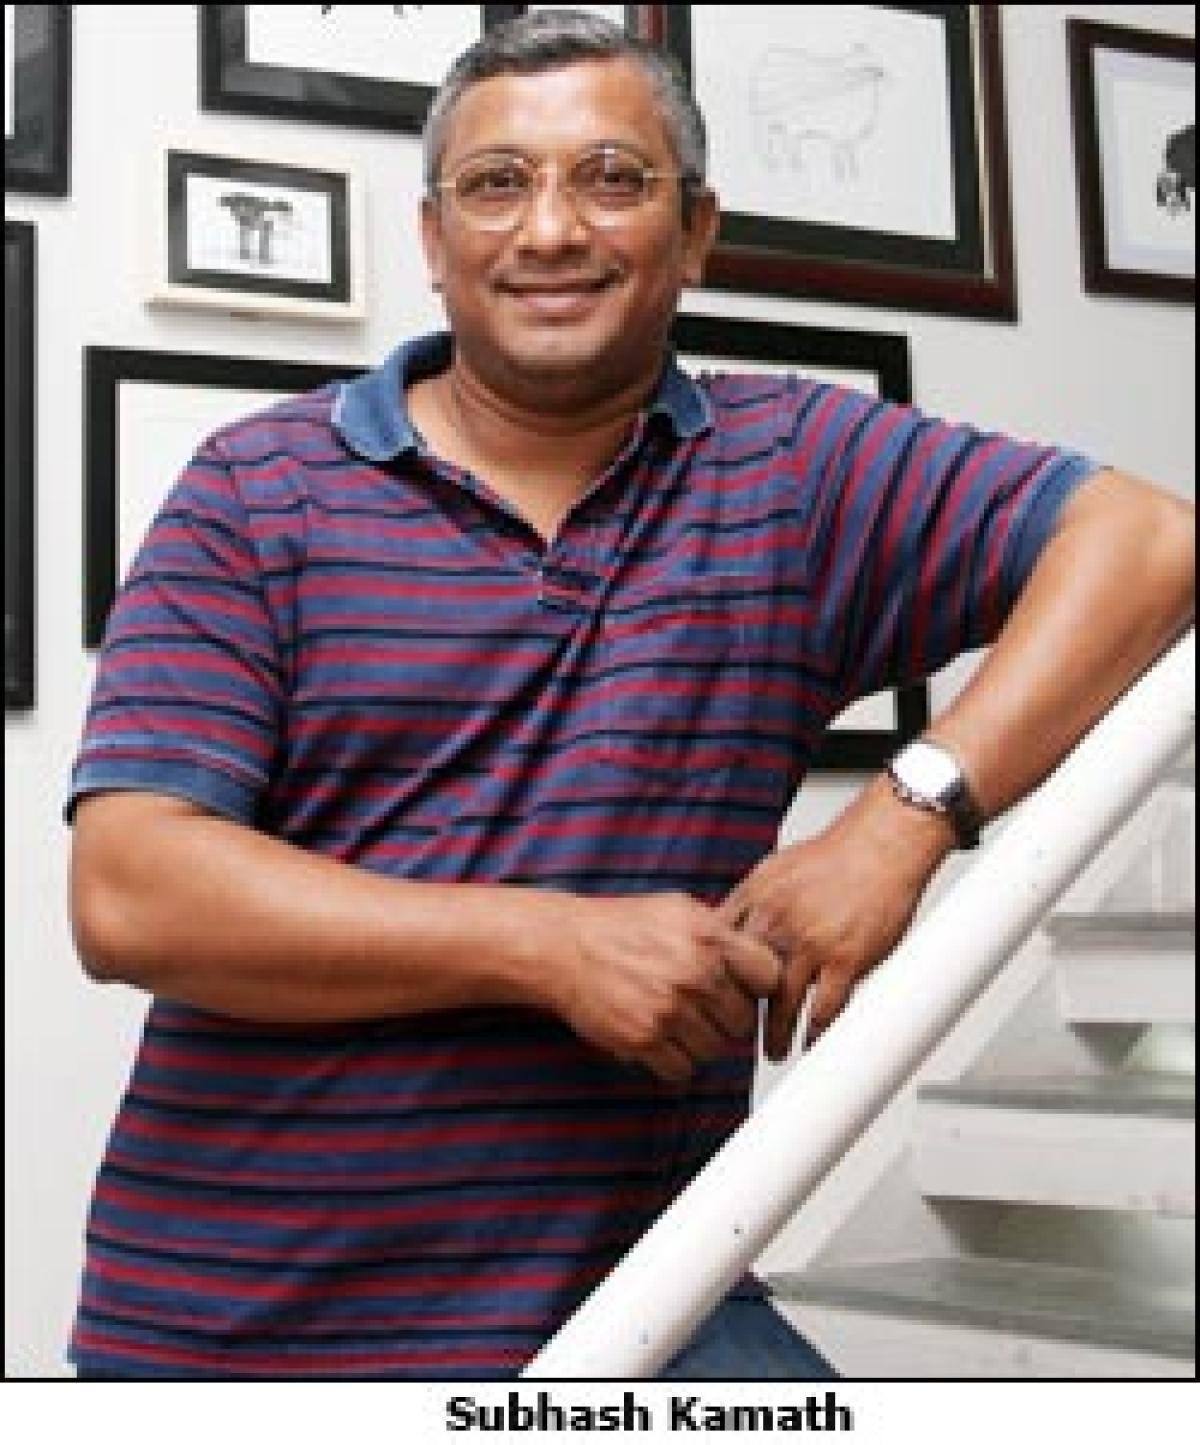 Defining Moments: Subhash Kamath: The journey has begun again